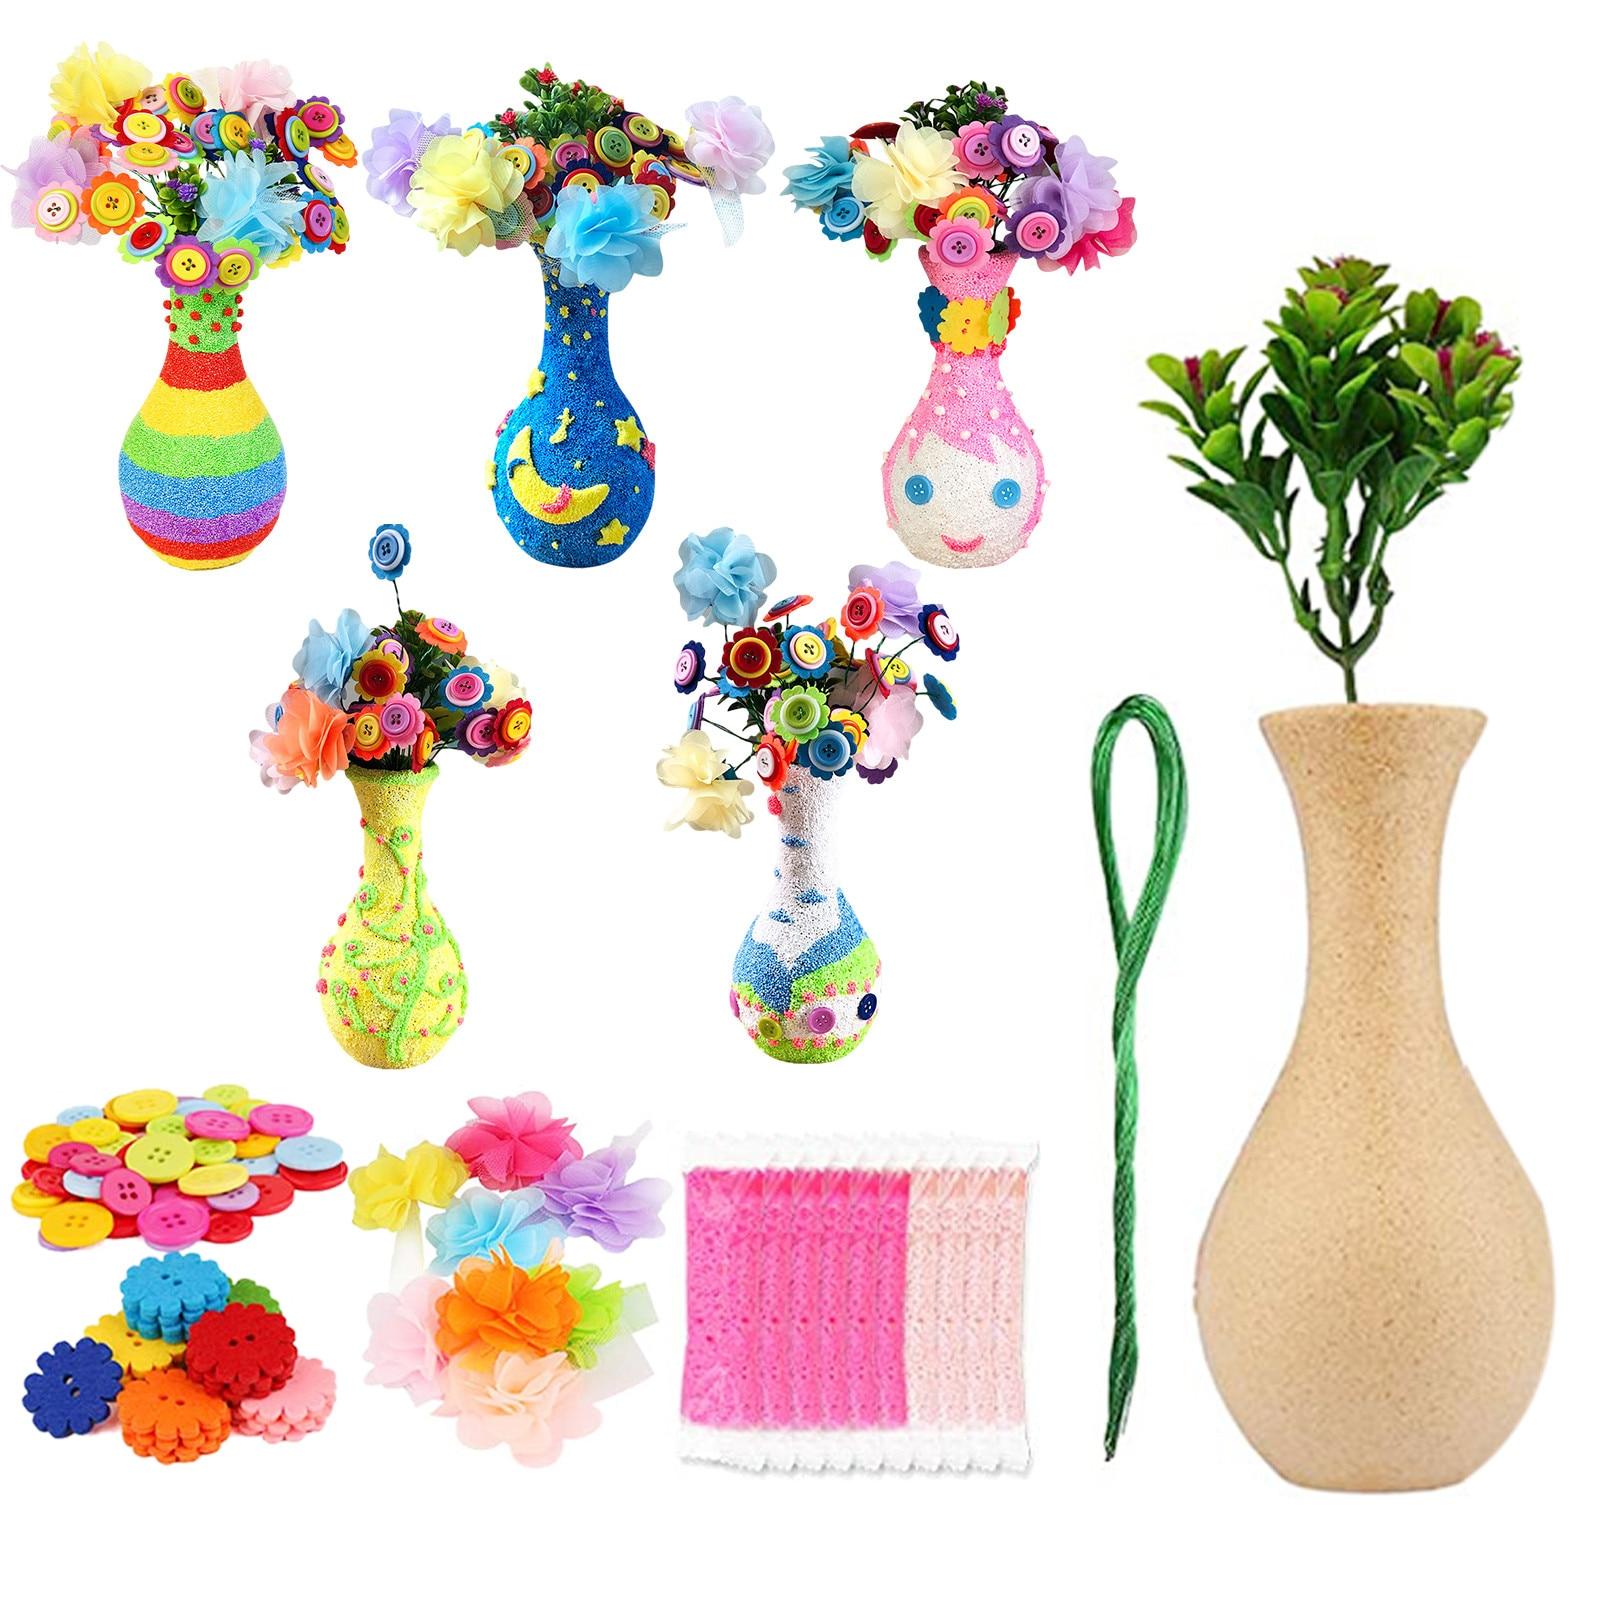 DIY Felt Toy Button Flower Craft Kits Kindergarten Kids Creative Toys Children Educational Handmade Gift Room Decoration